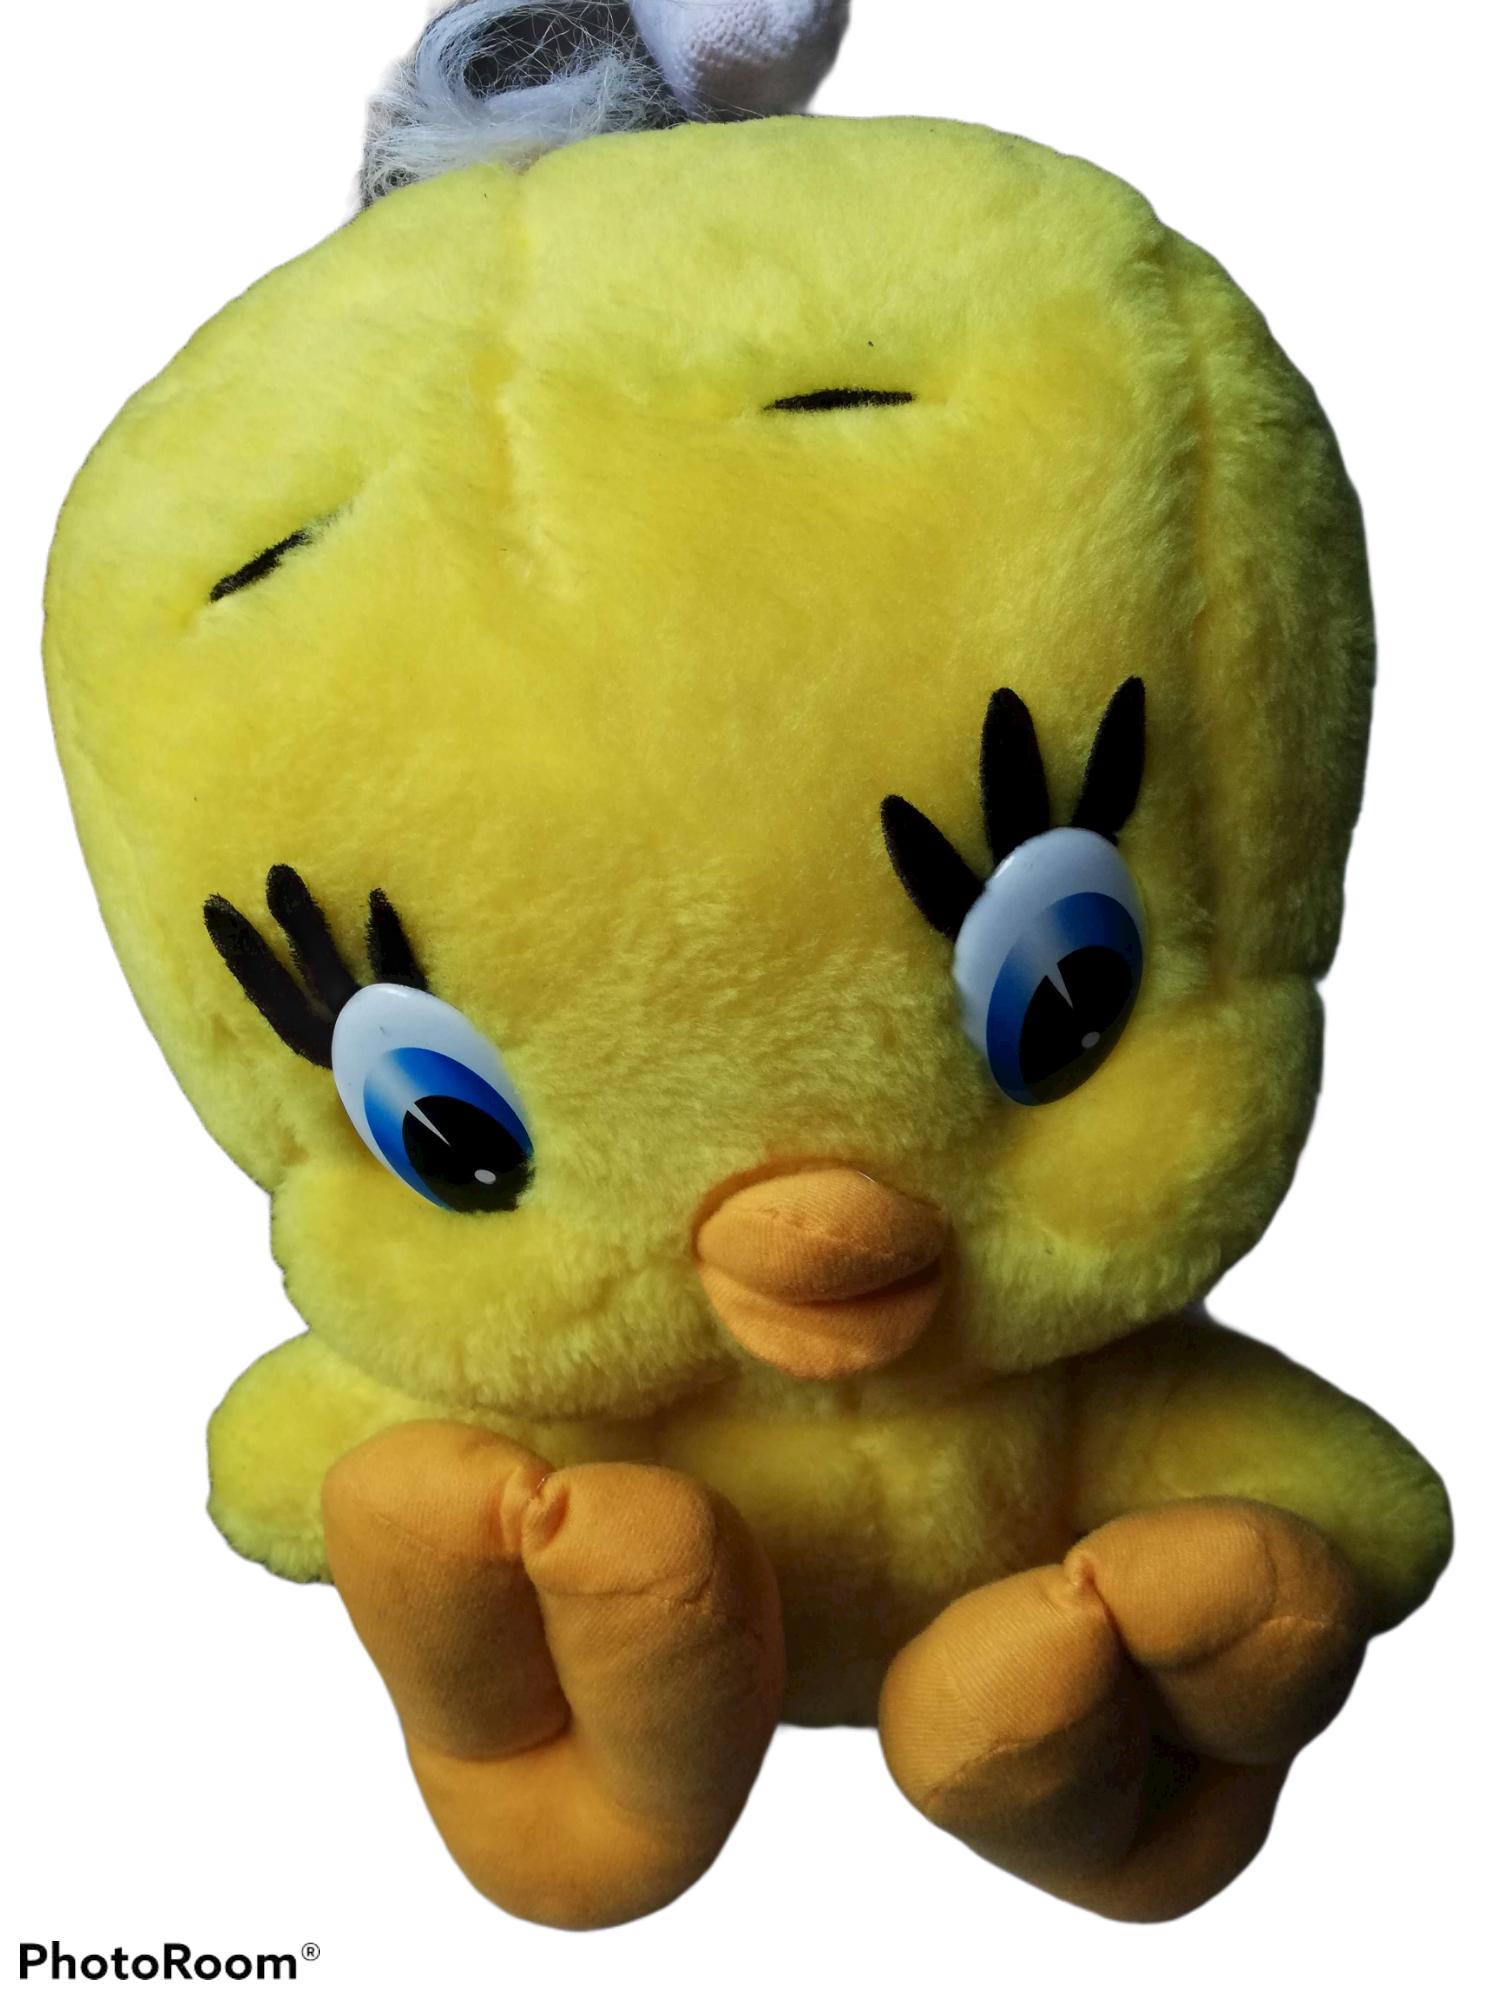 Tweety knuffel 46 cm hoog